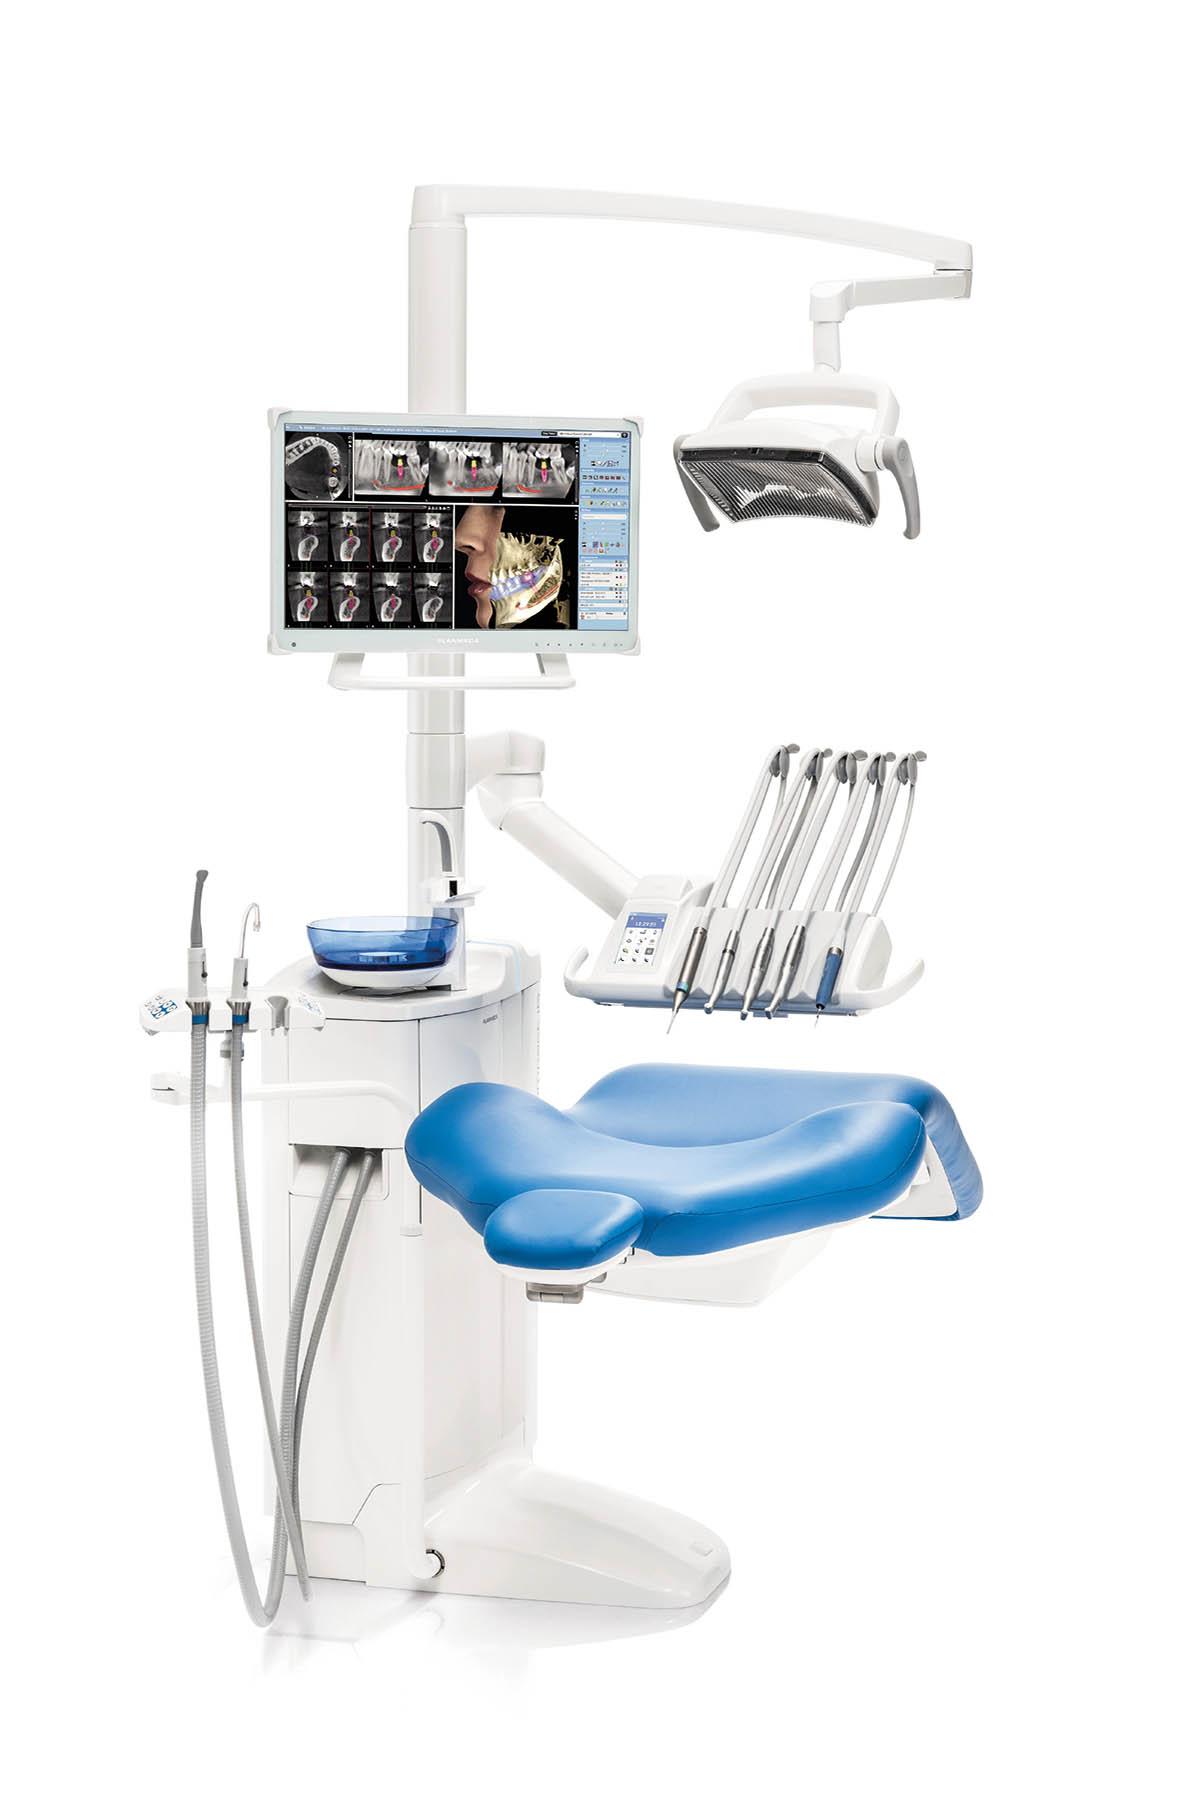 Planmeca Compact™ i5